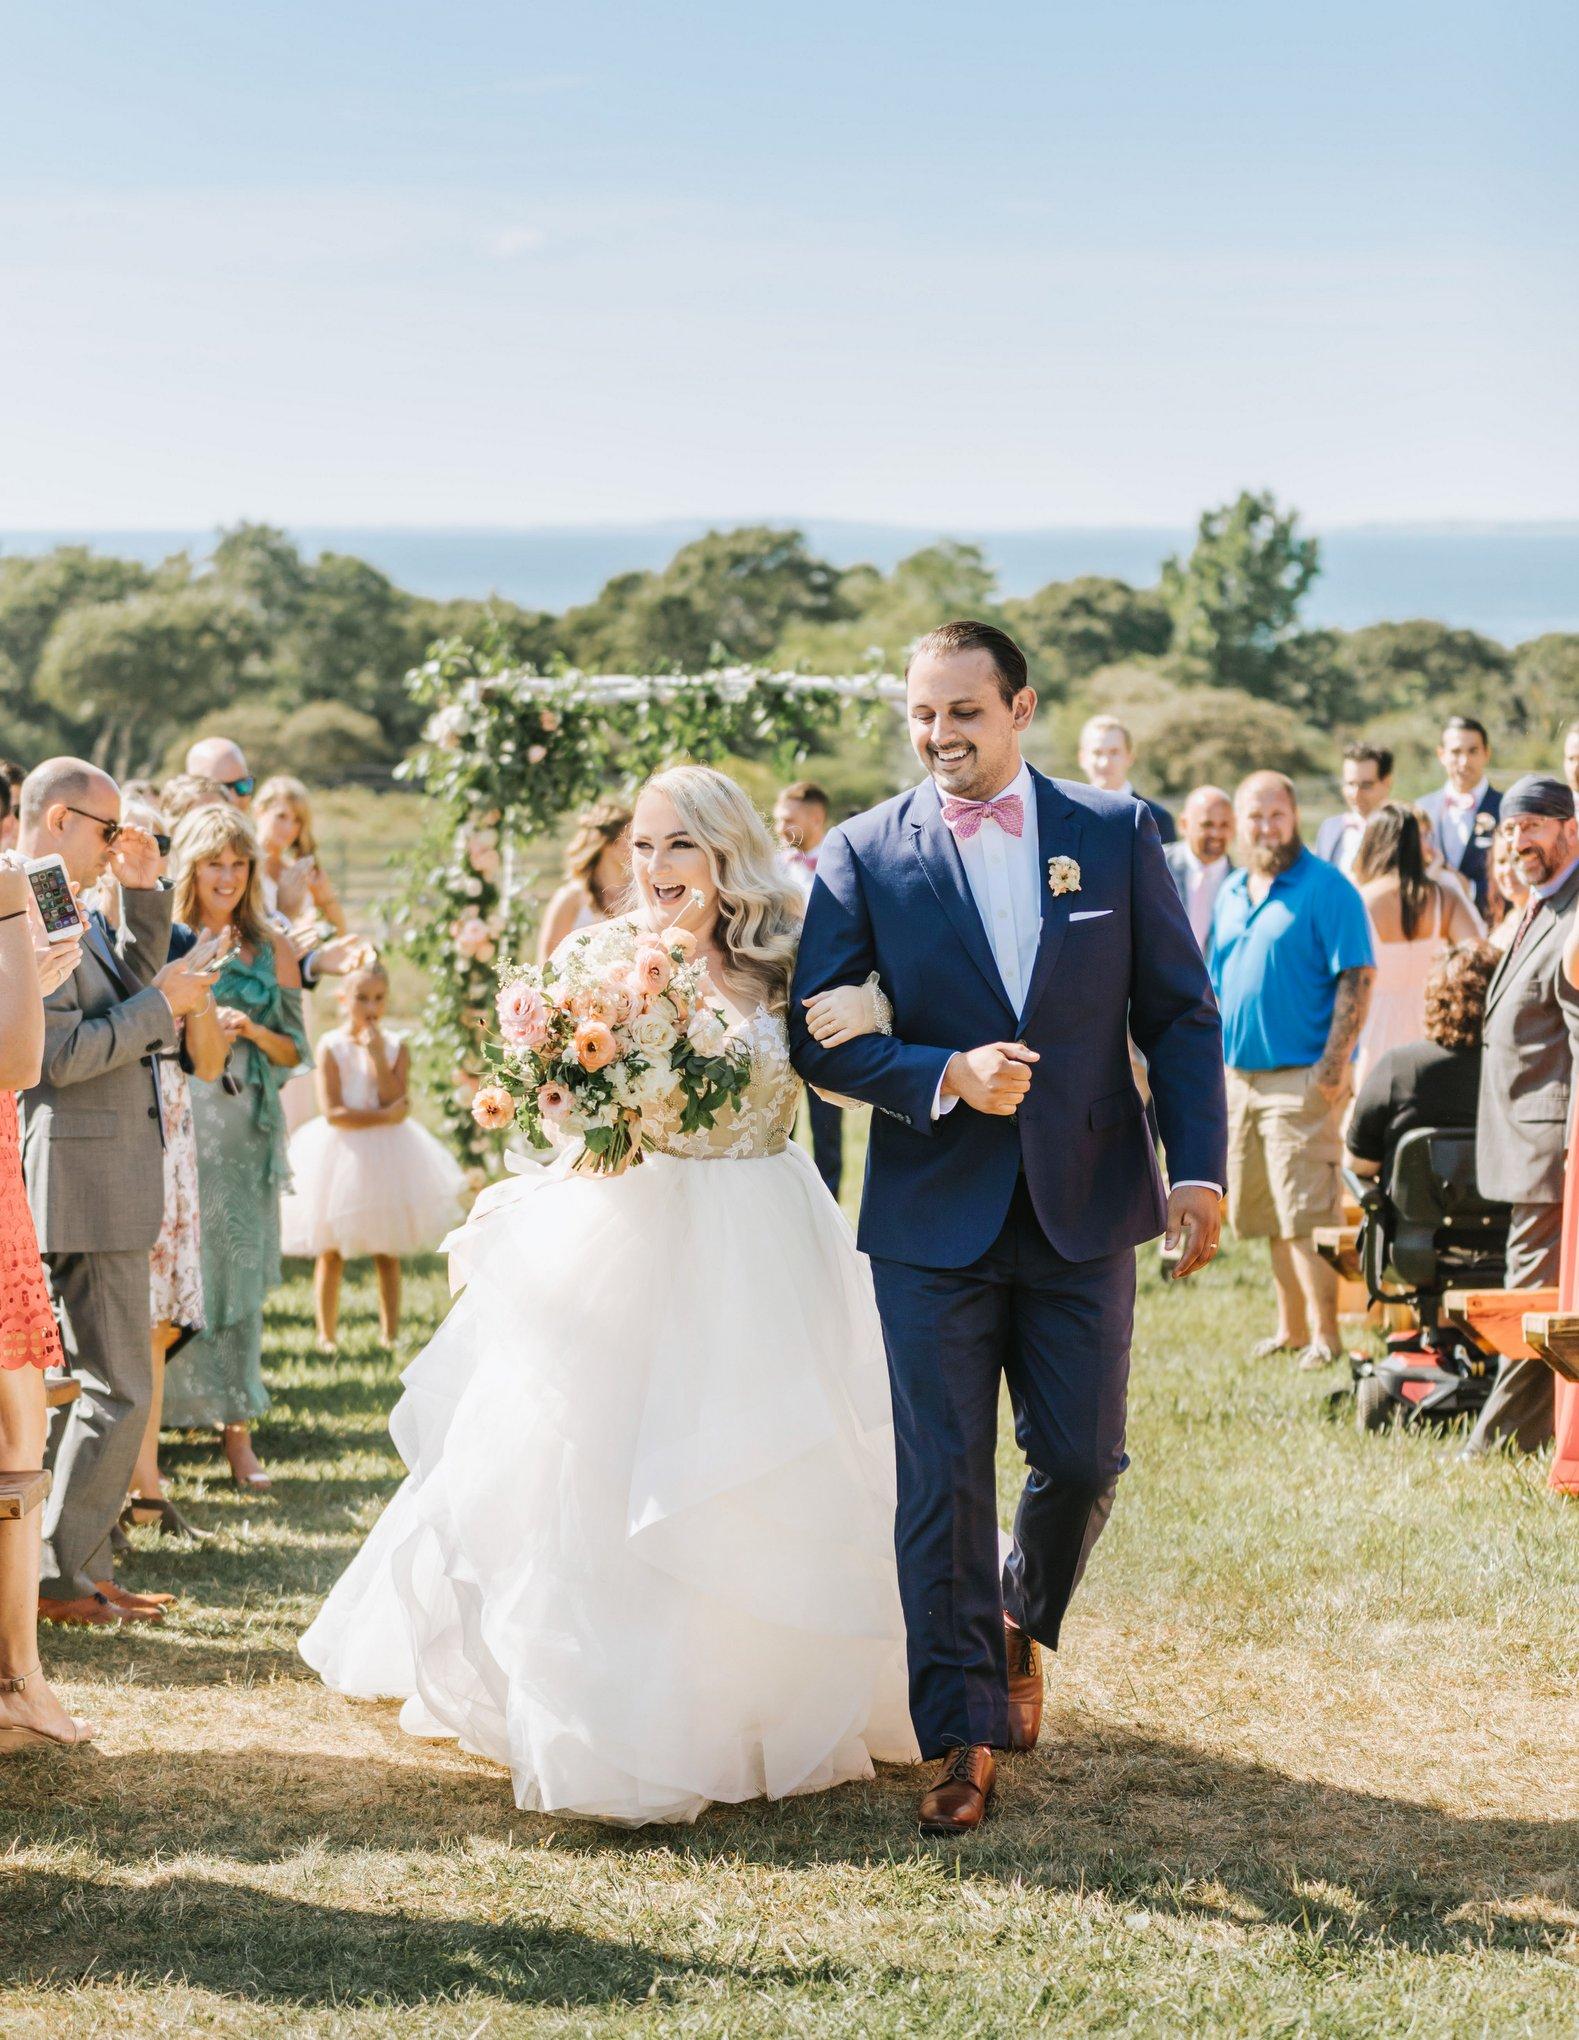 Marthas-Vineyard-Wedding-Photographer-Beach-Plum-Inn-23.jpg